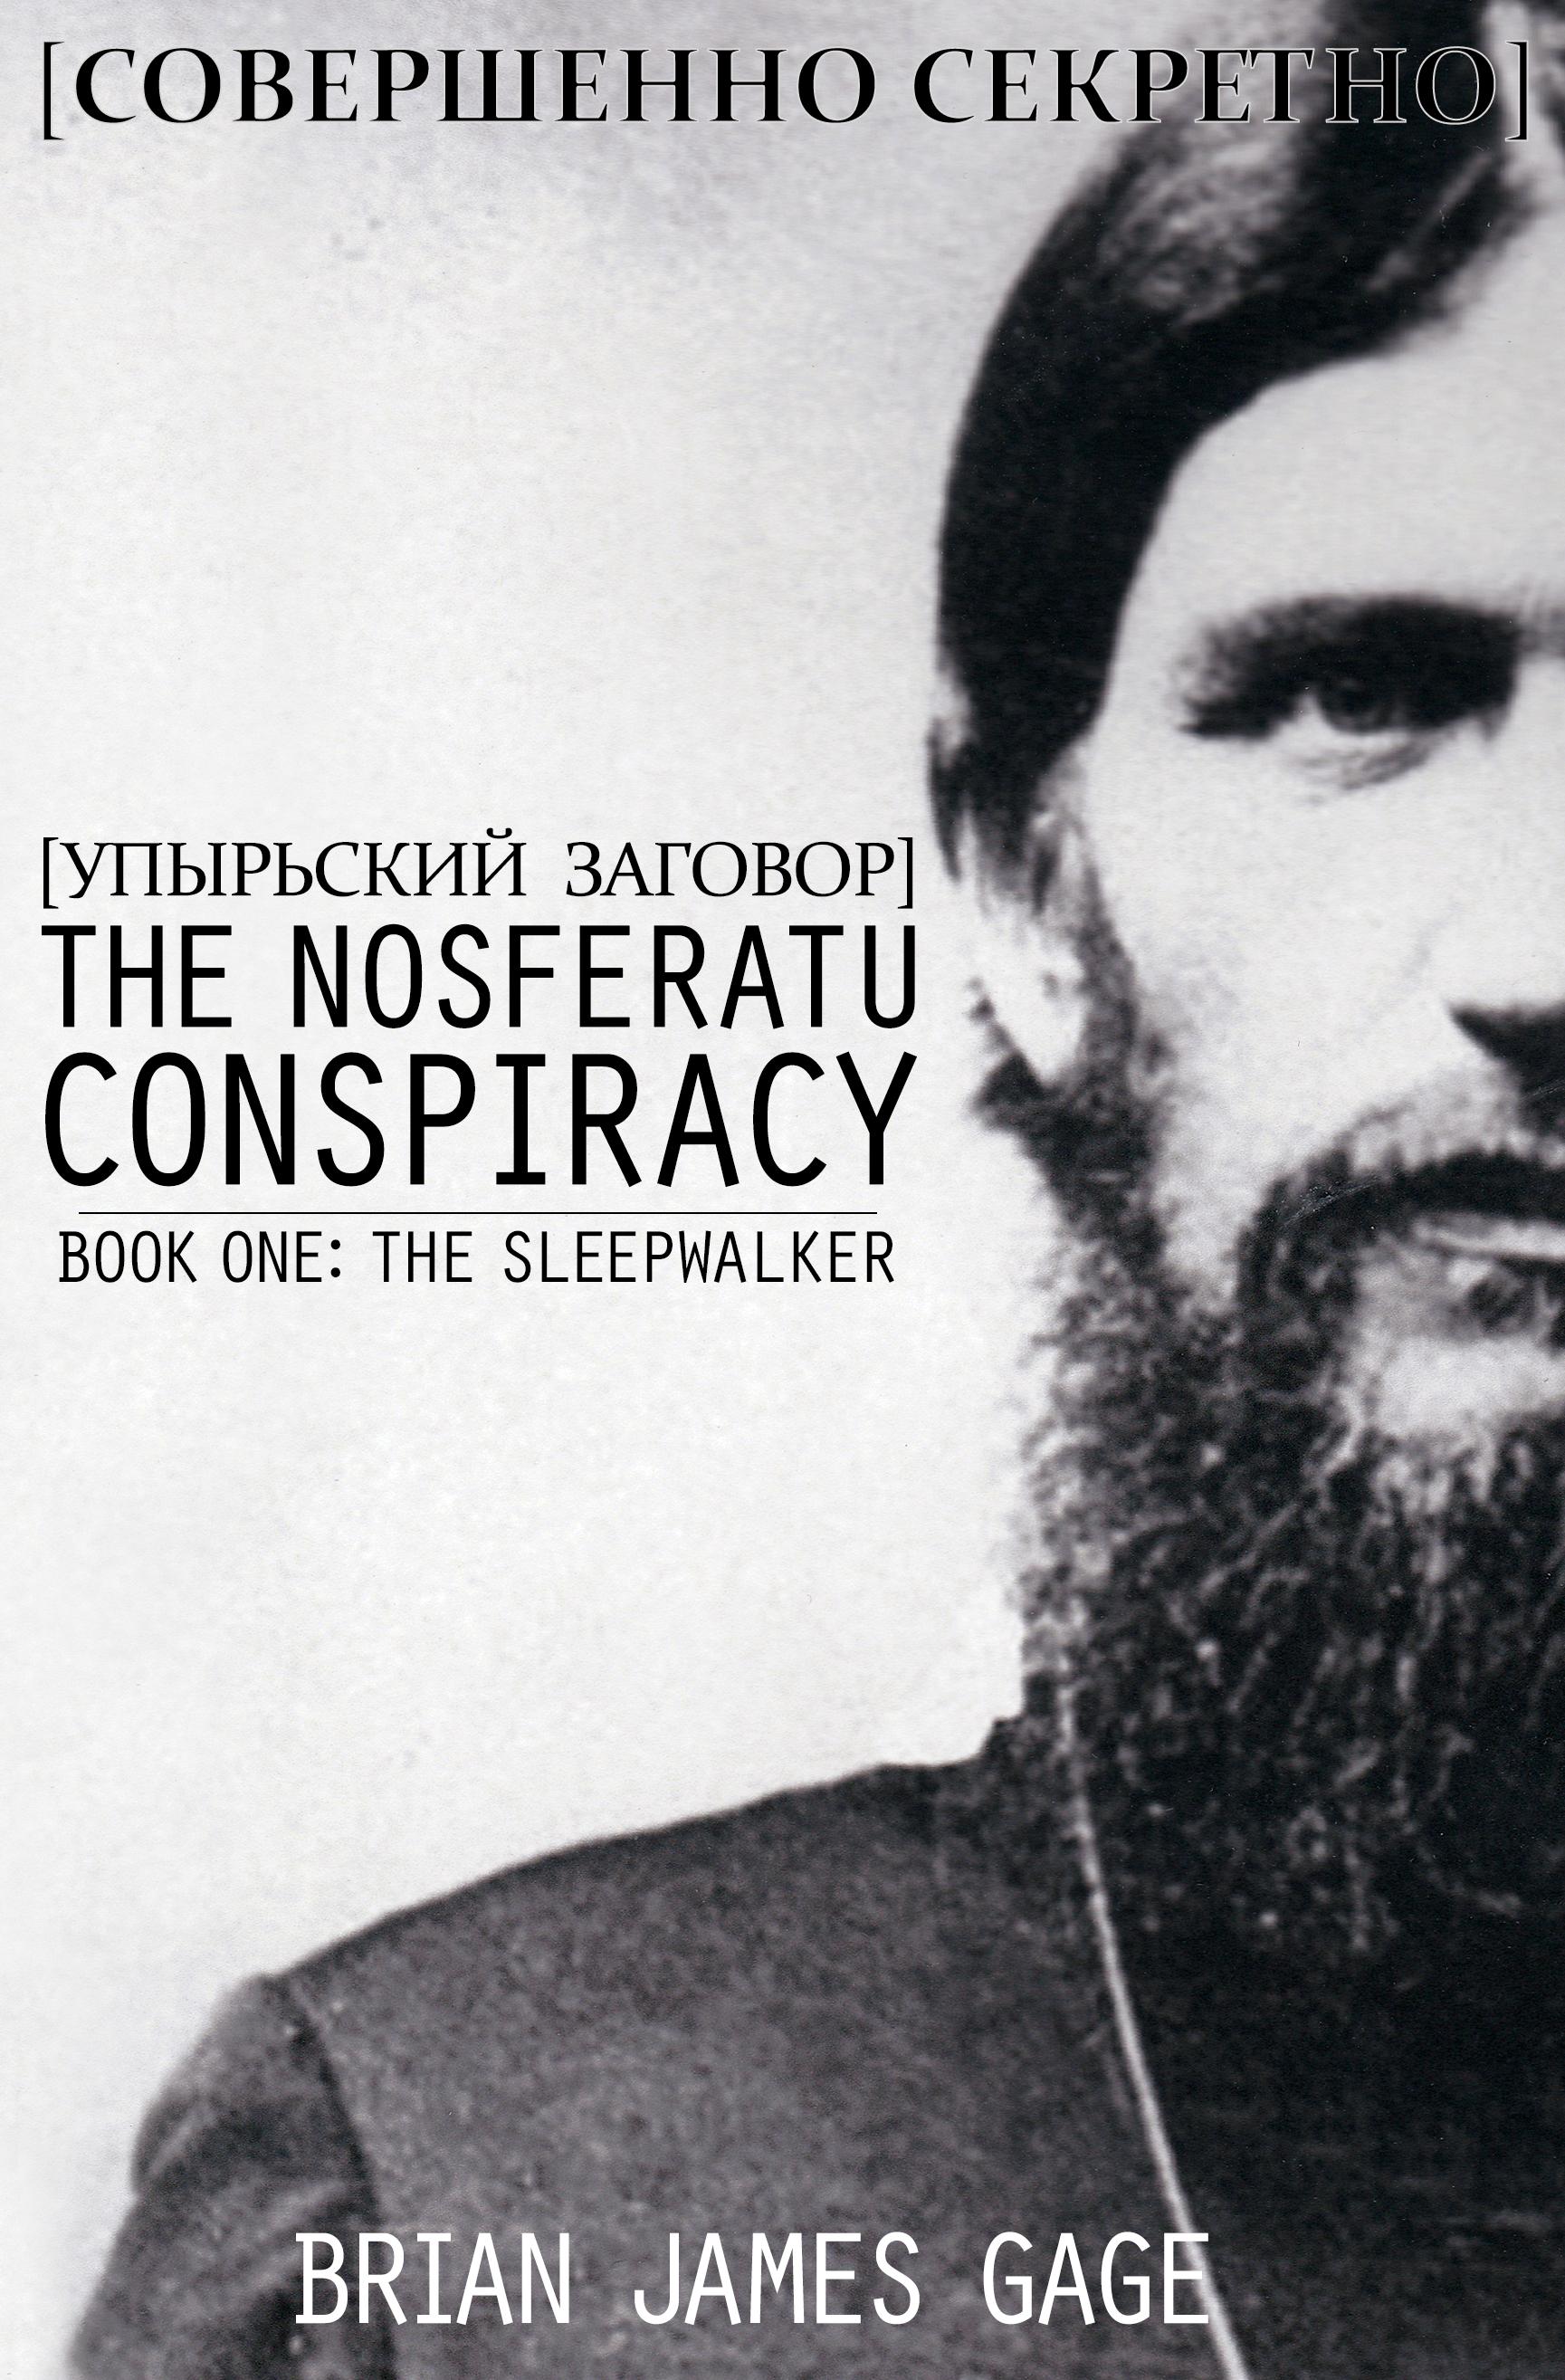 The Nosferatu Conspiracy, Book One: The Sleepwalker